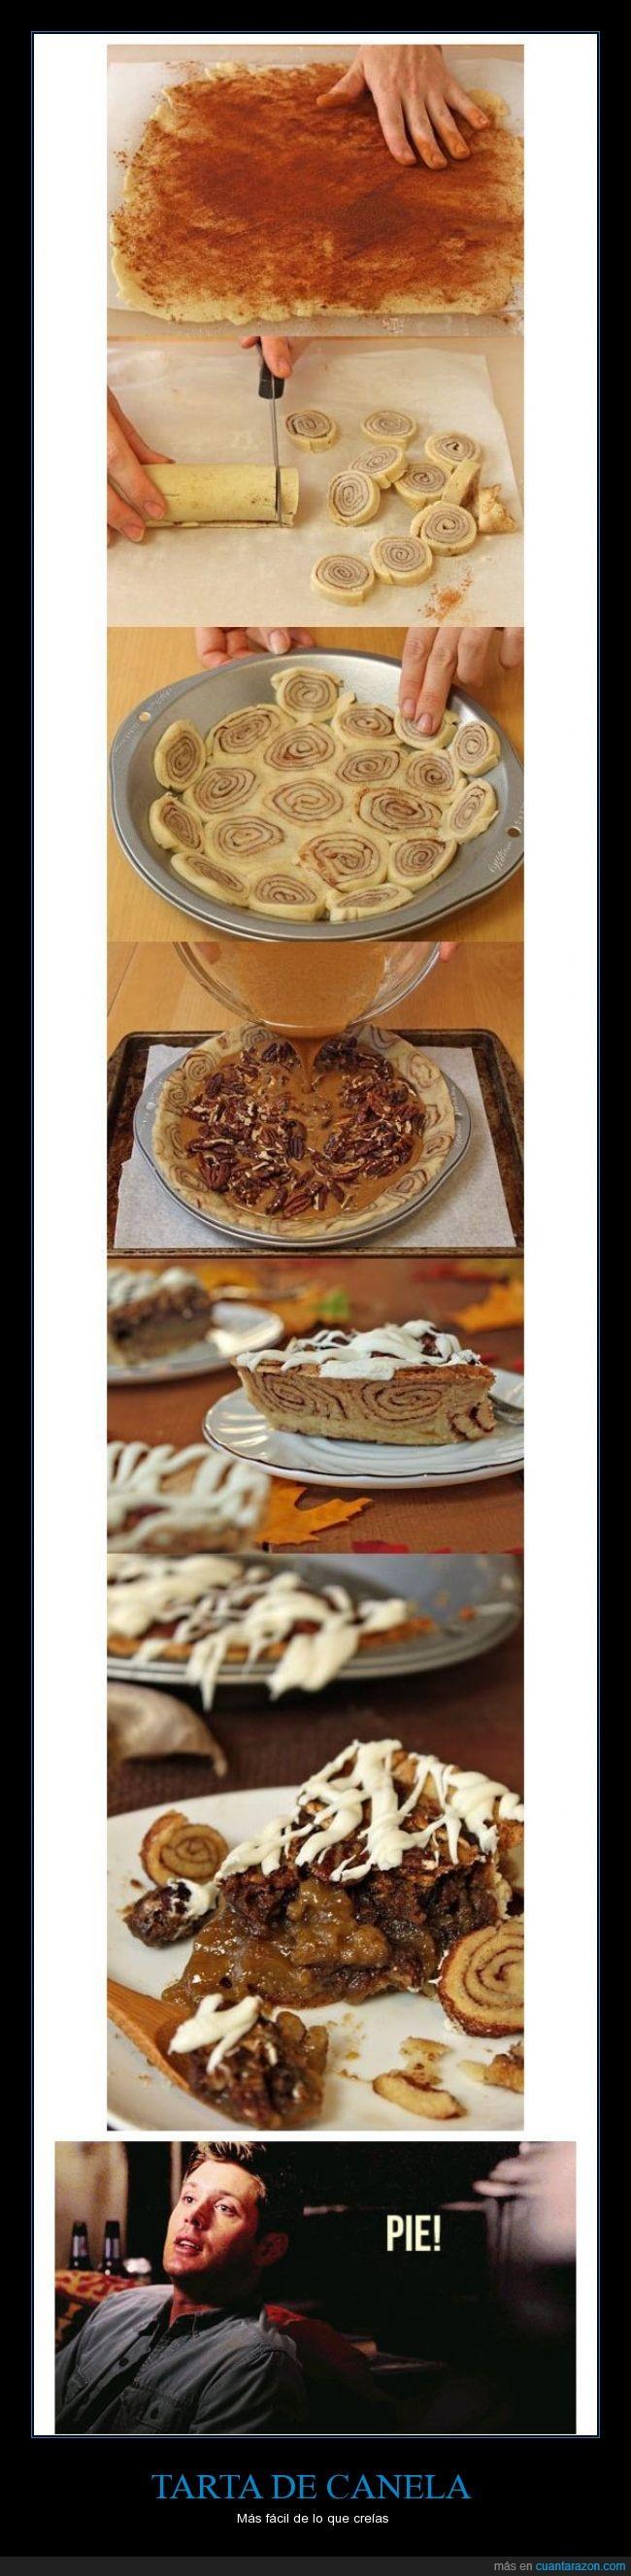 canela,cinnamon,comida,Dean Winchester,genial,pie,receta,rico,supernatural,tarta